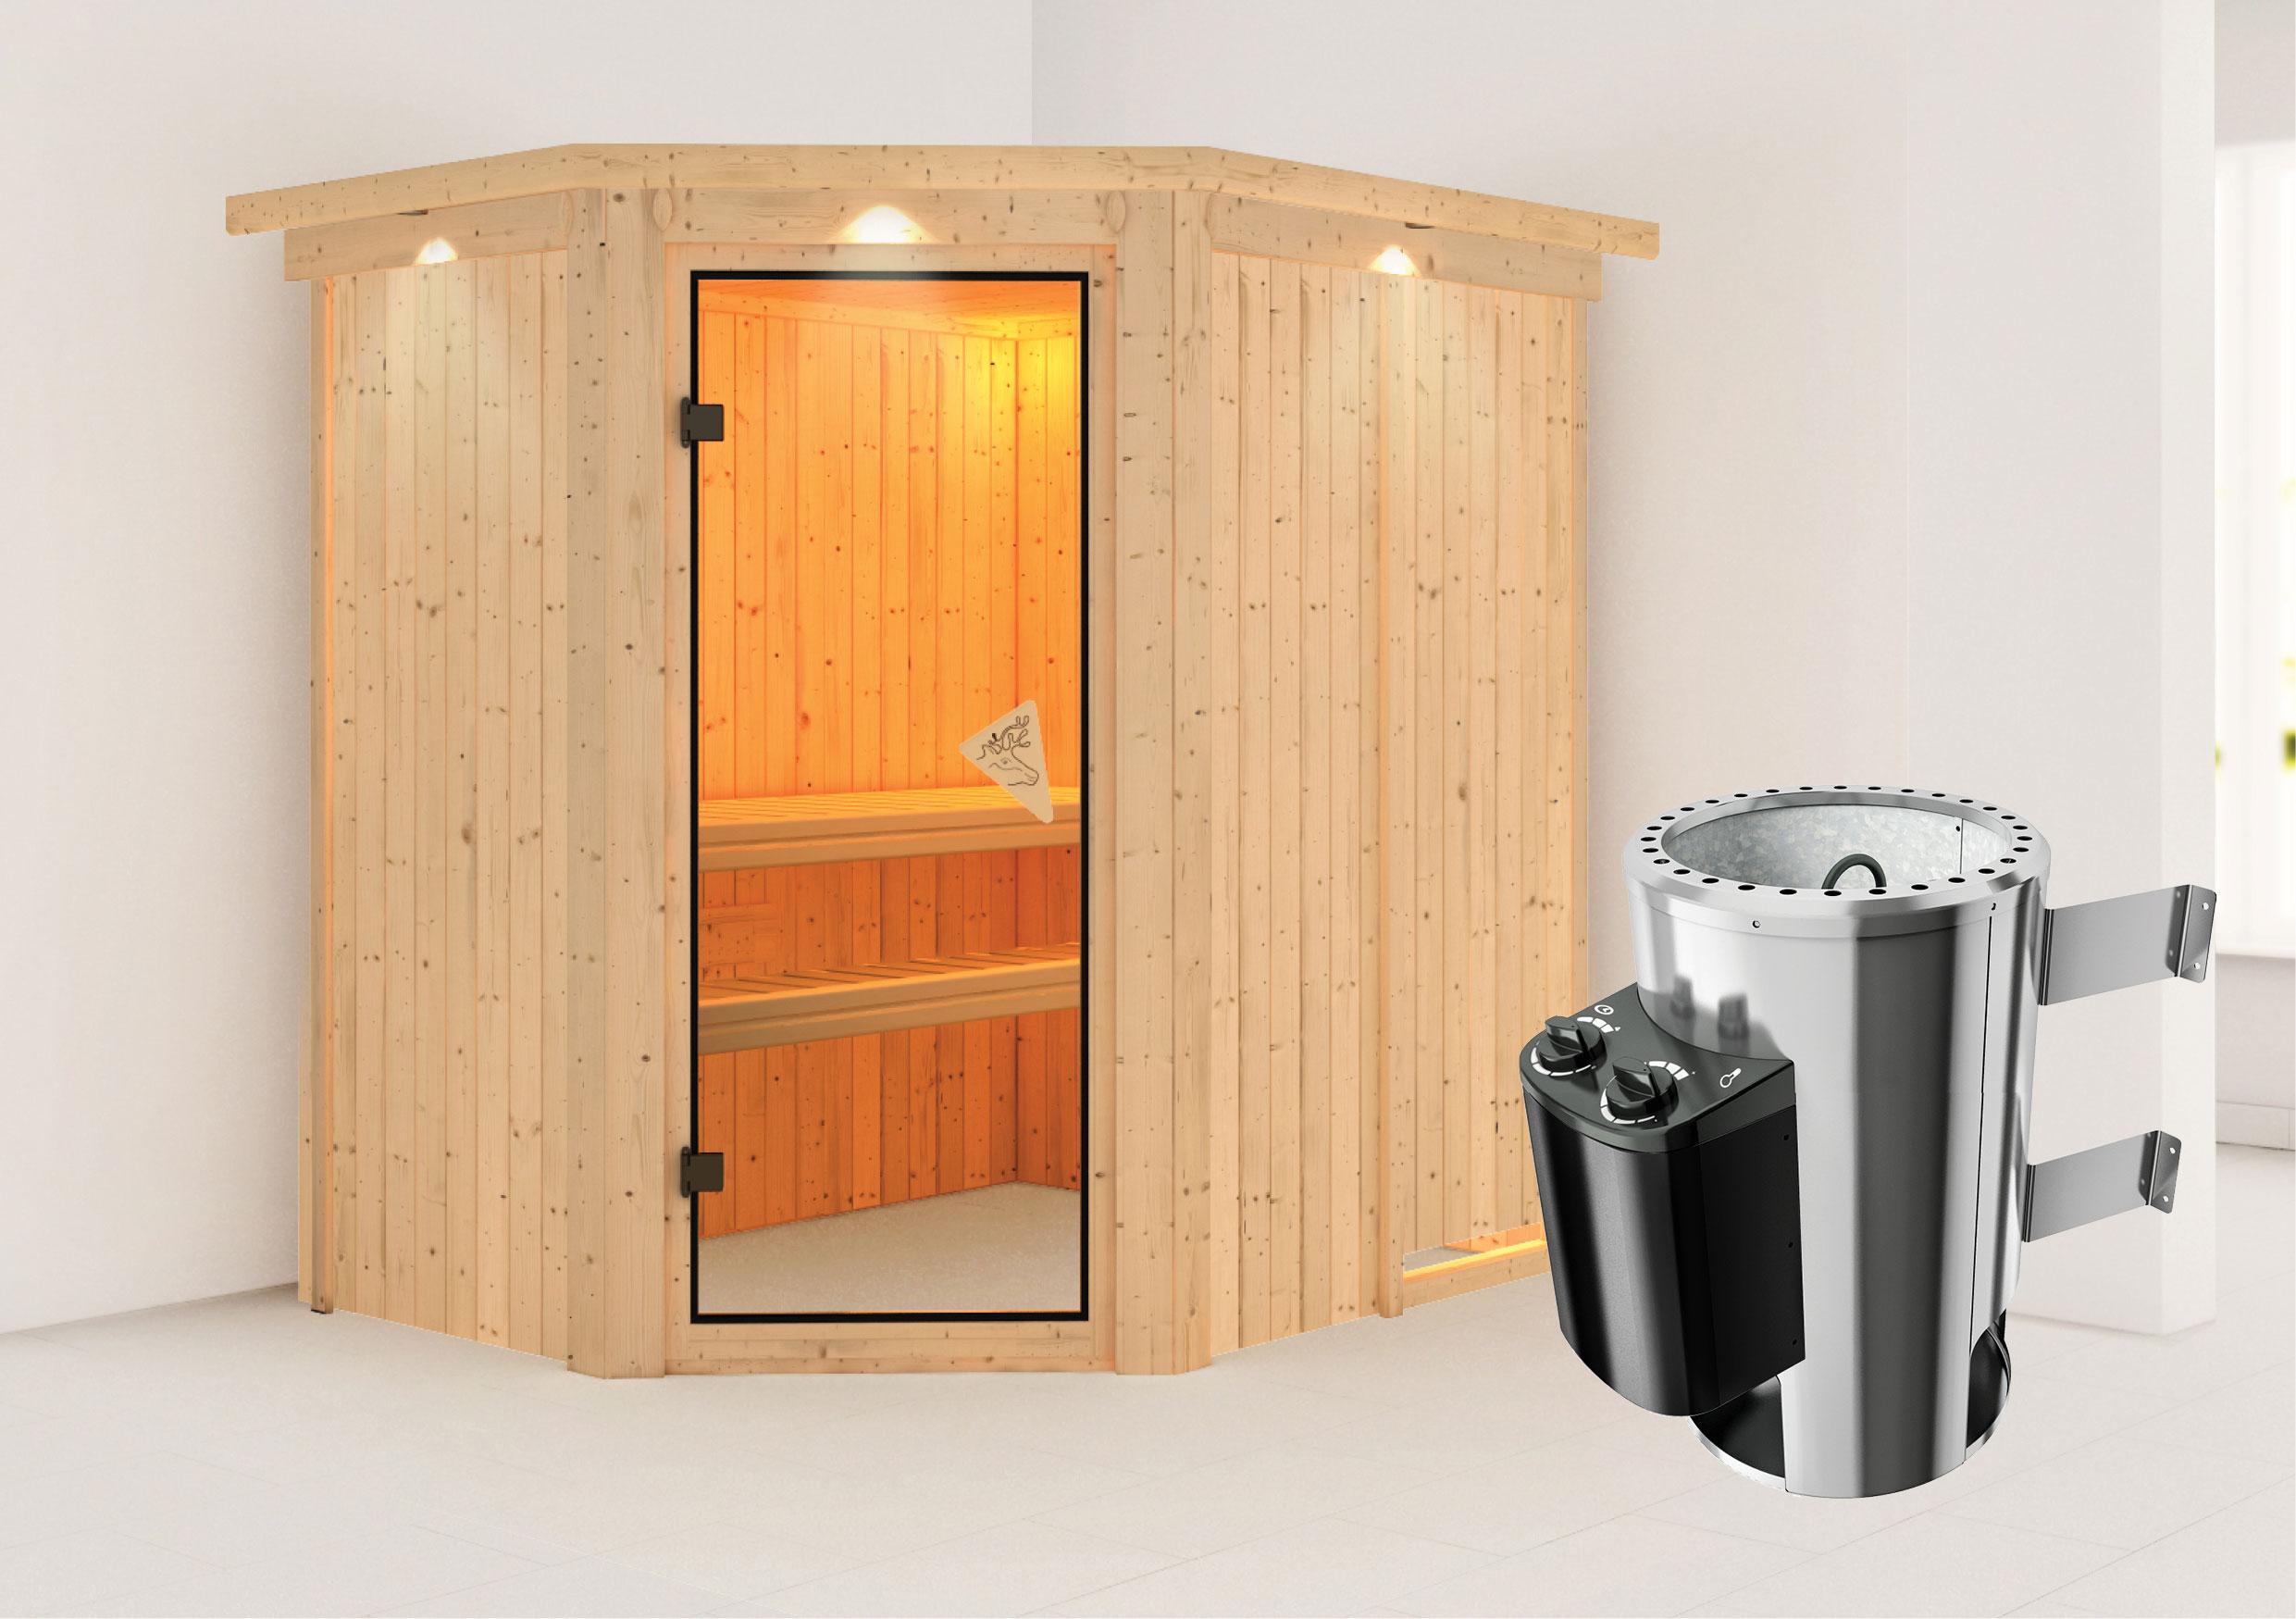 Karibu Sauna Saja 68mm 230V Dachkranz + Ofen 3,6kW intern classic Tür Bild 1